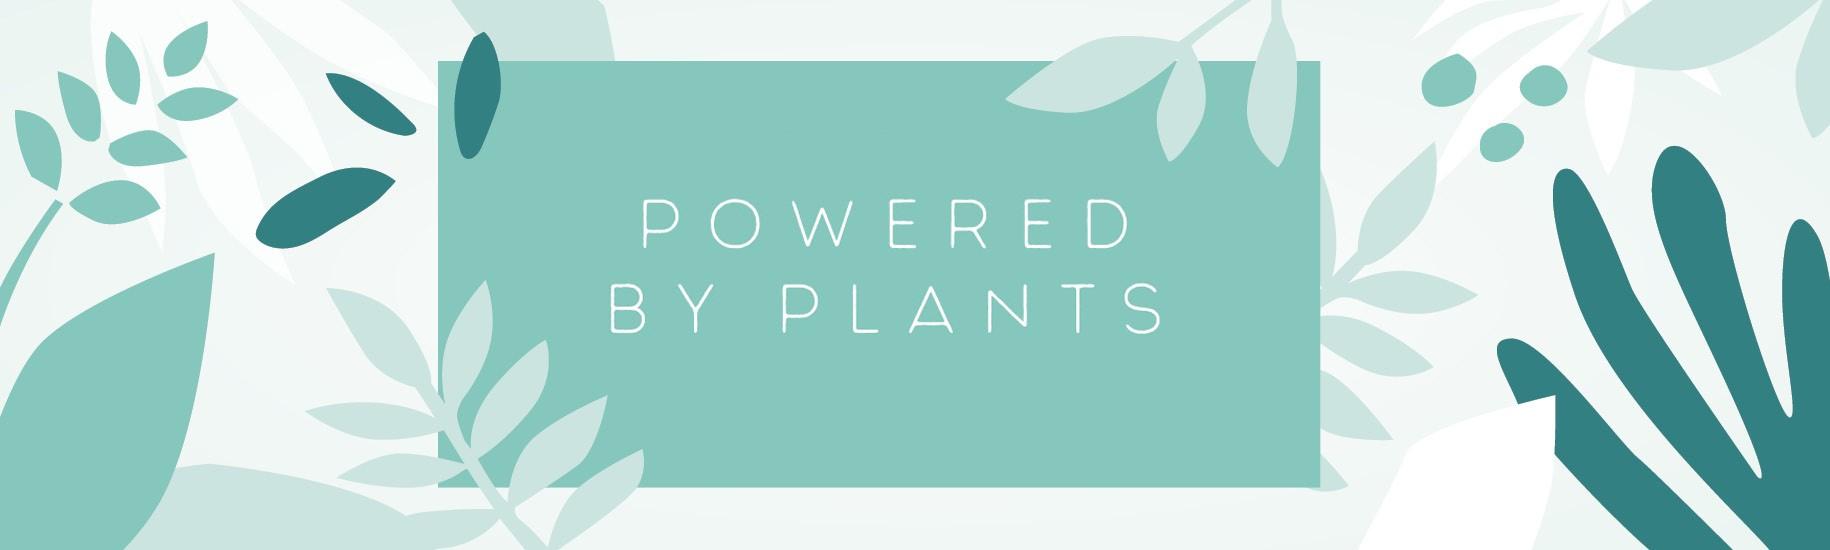 Nourish Veganuary Go Vegan Powered by Plants